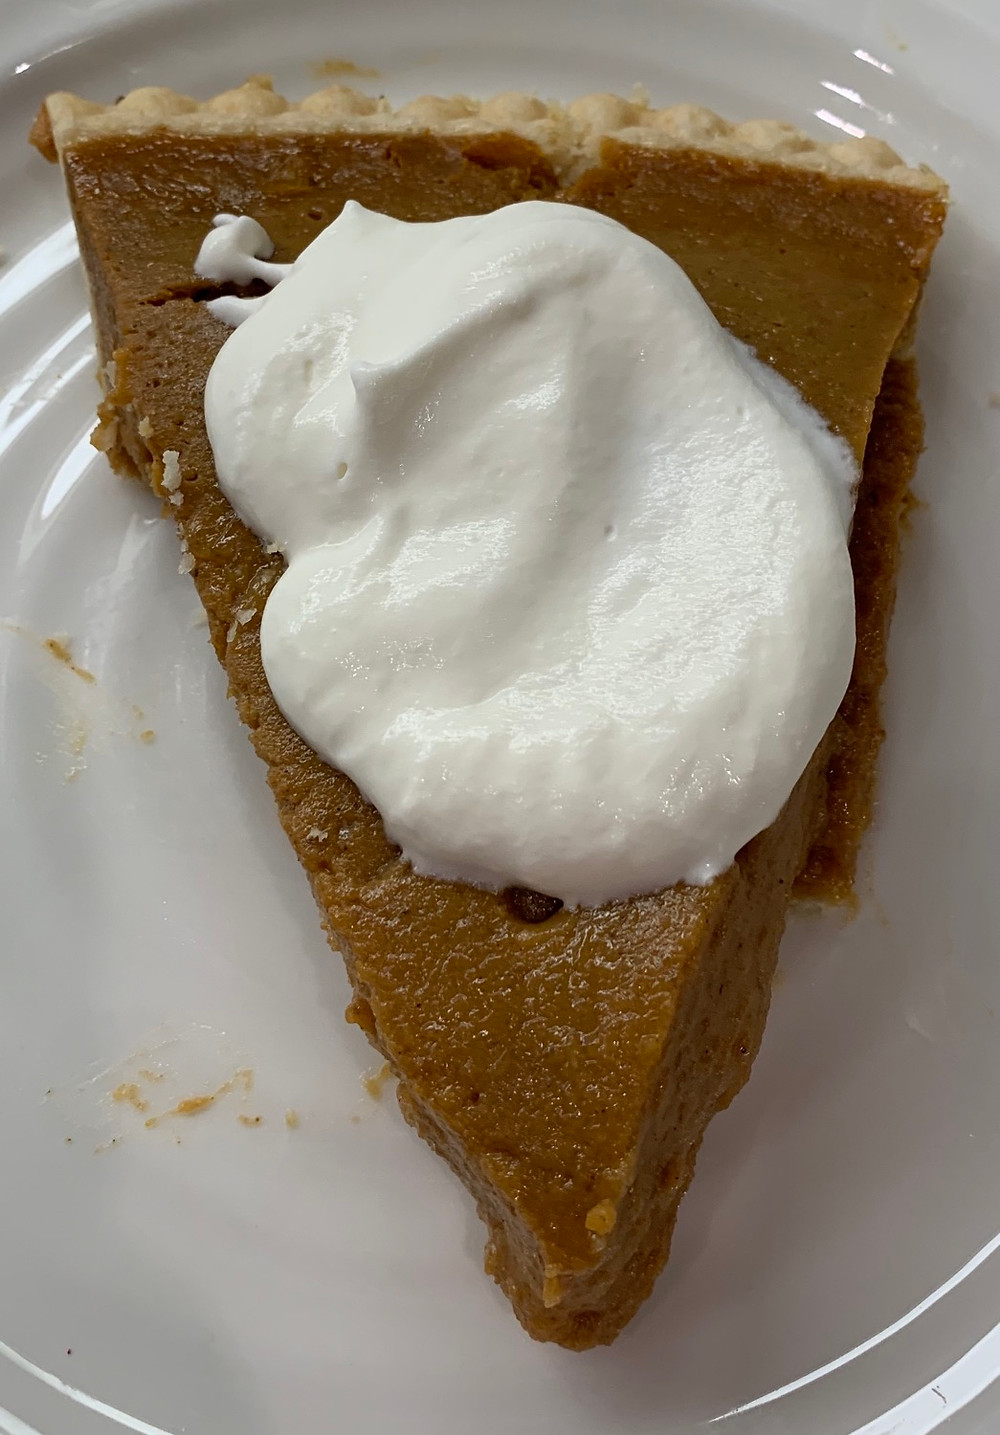 Costco Pumpkin Pie & Whipped Cream